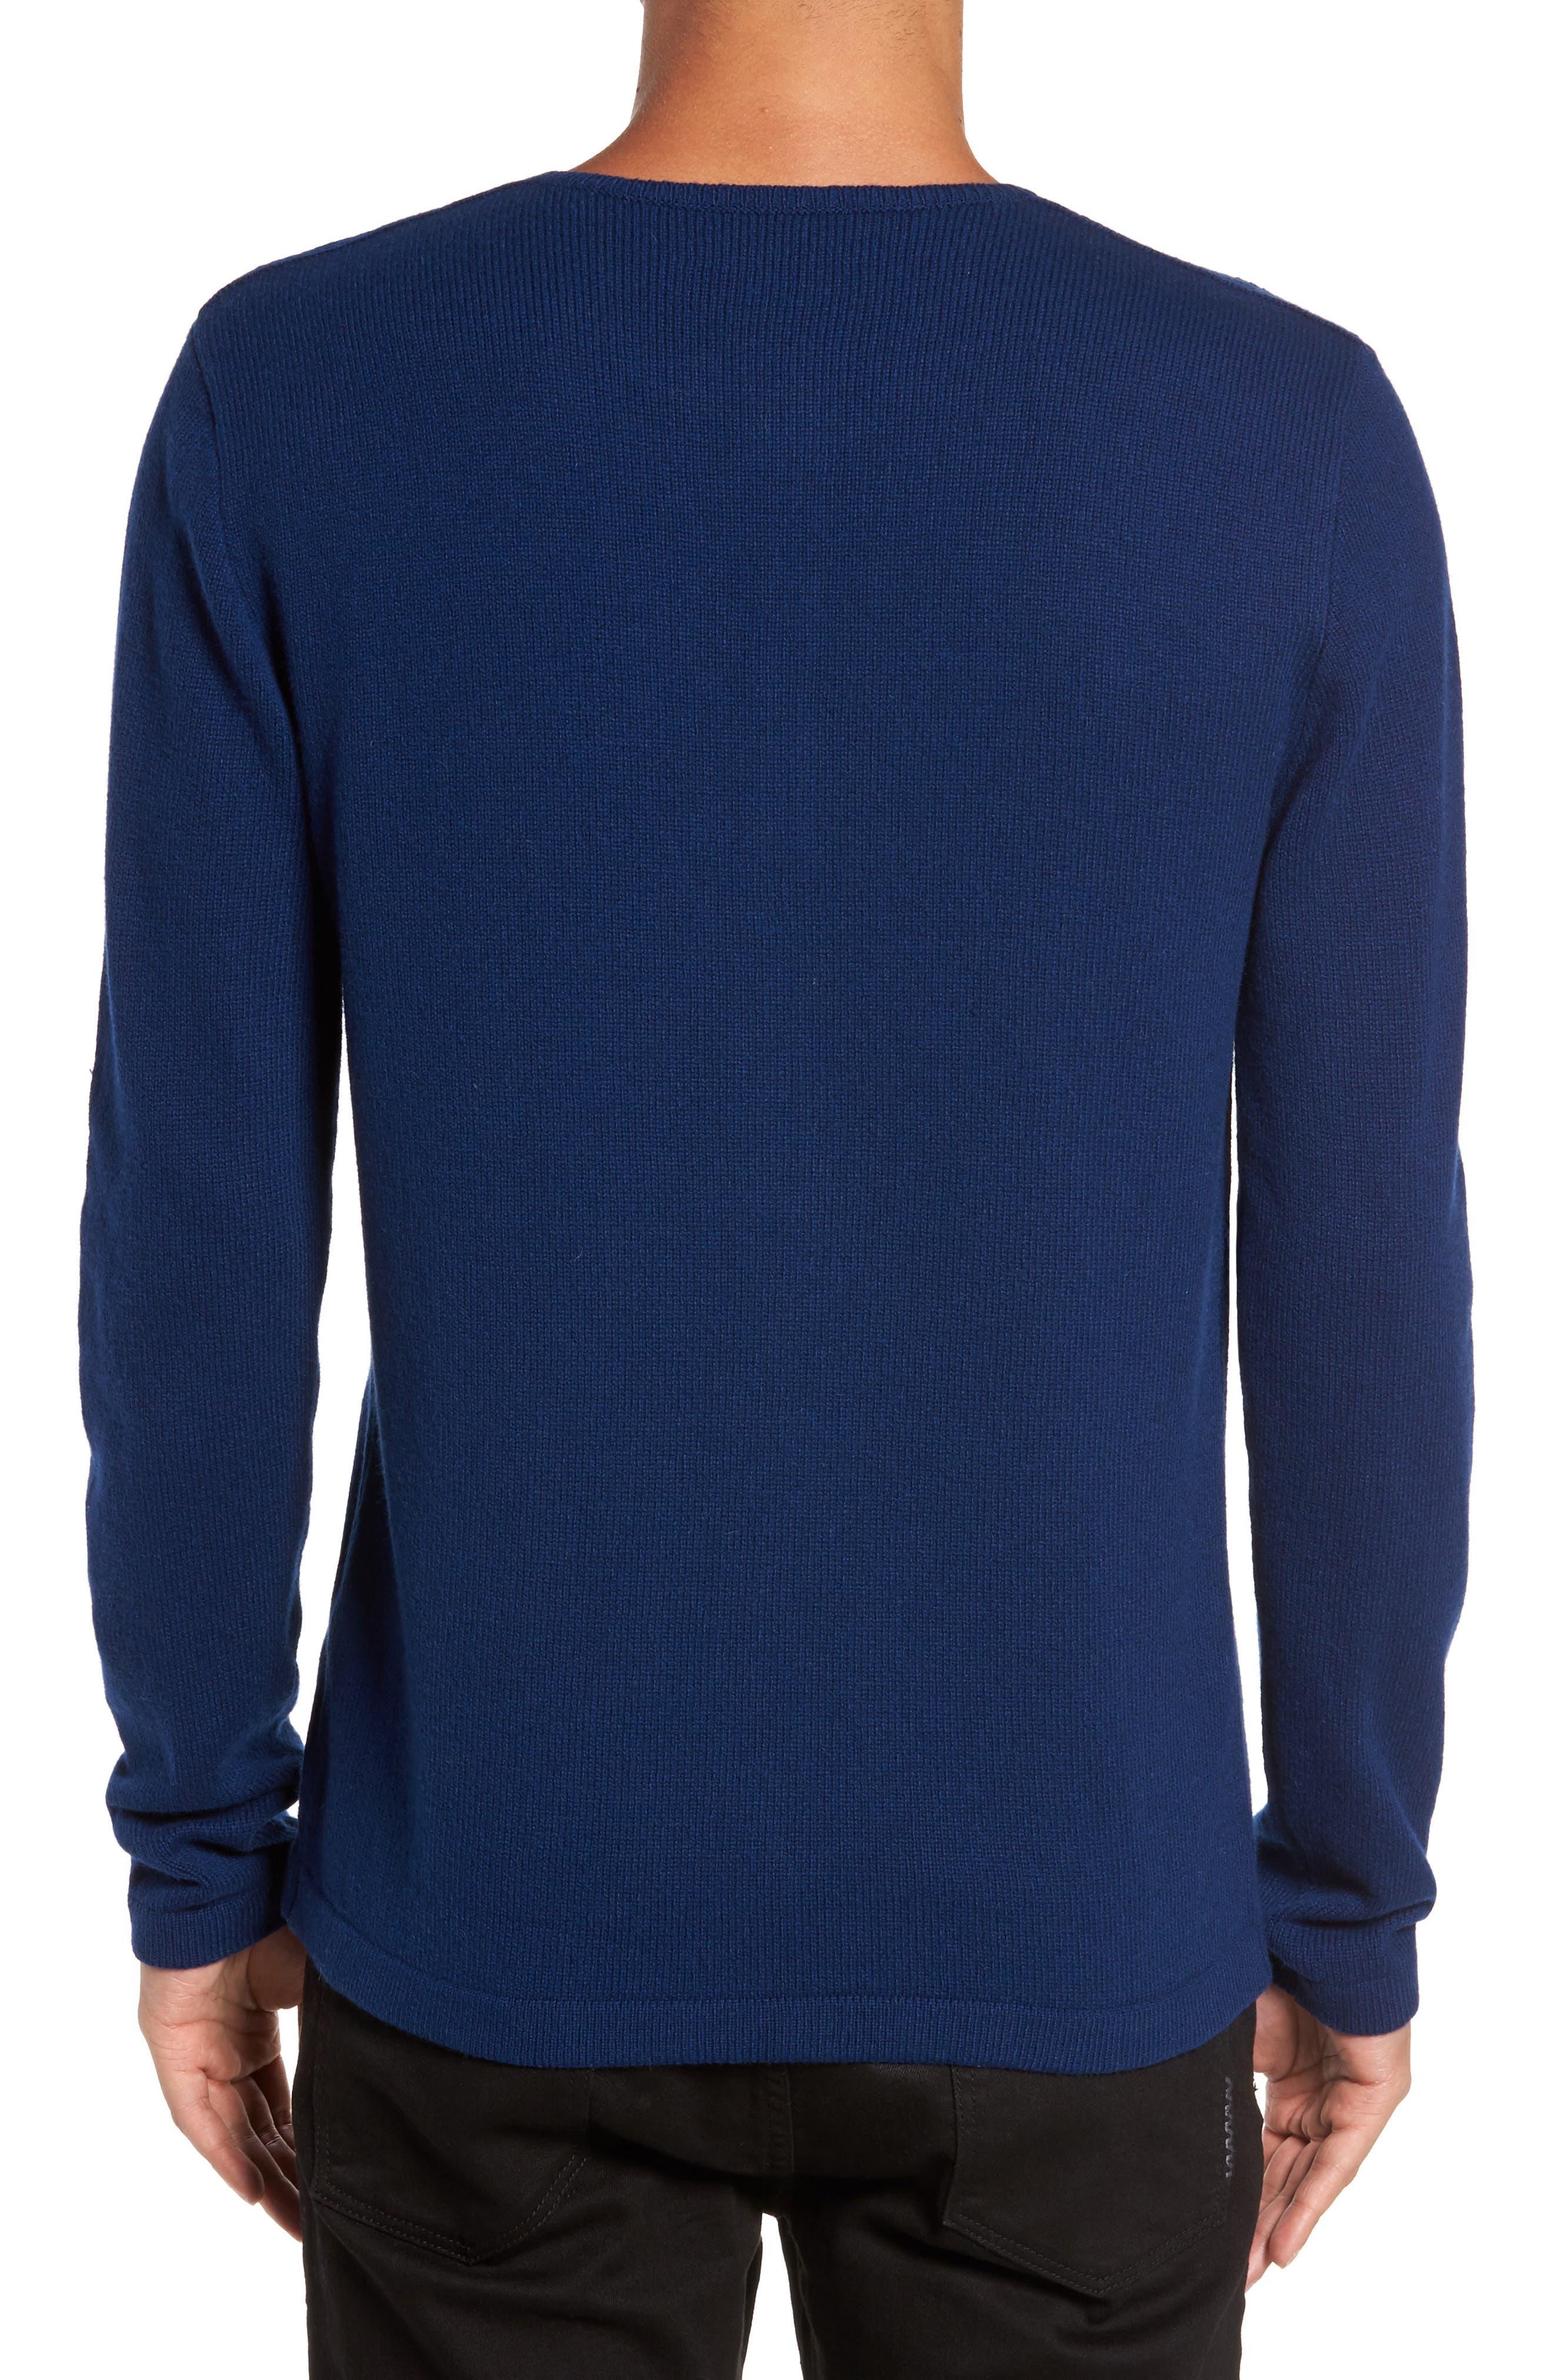 Henley Sweater,                             Alternate thumbnail 2, color,                             Atlantic Blue